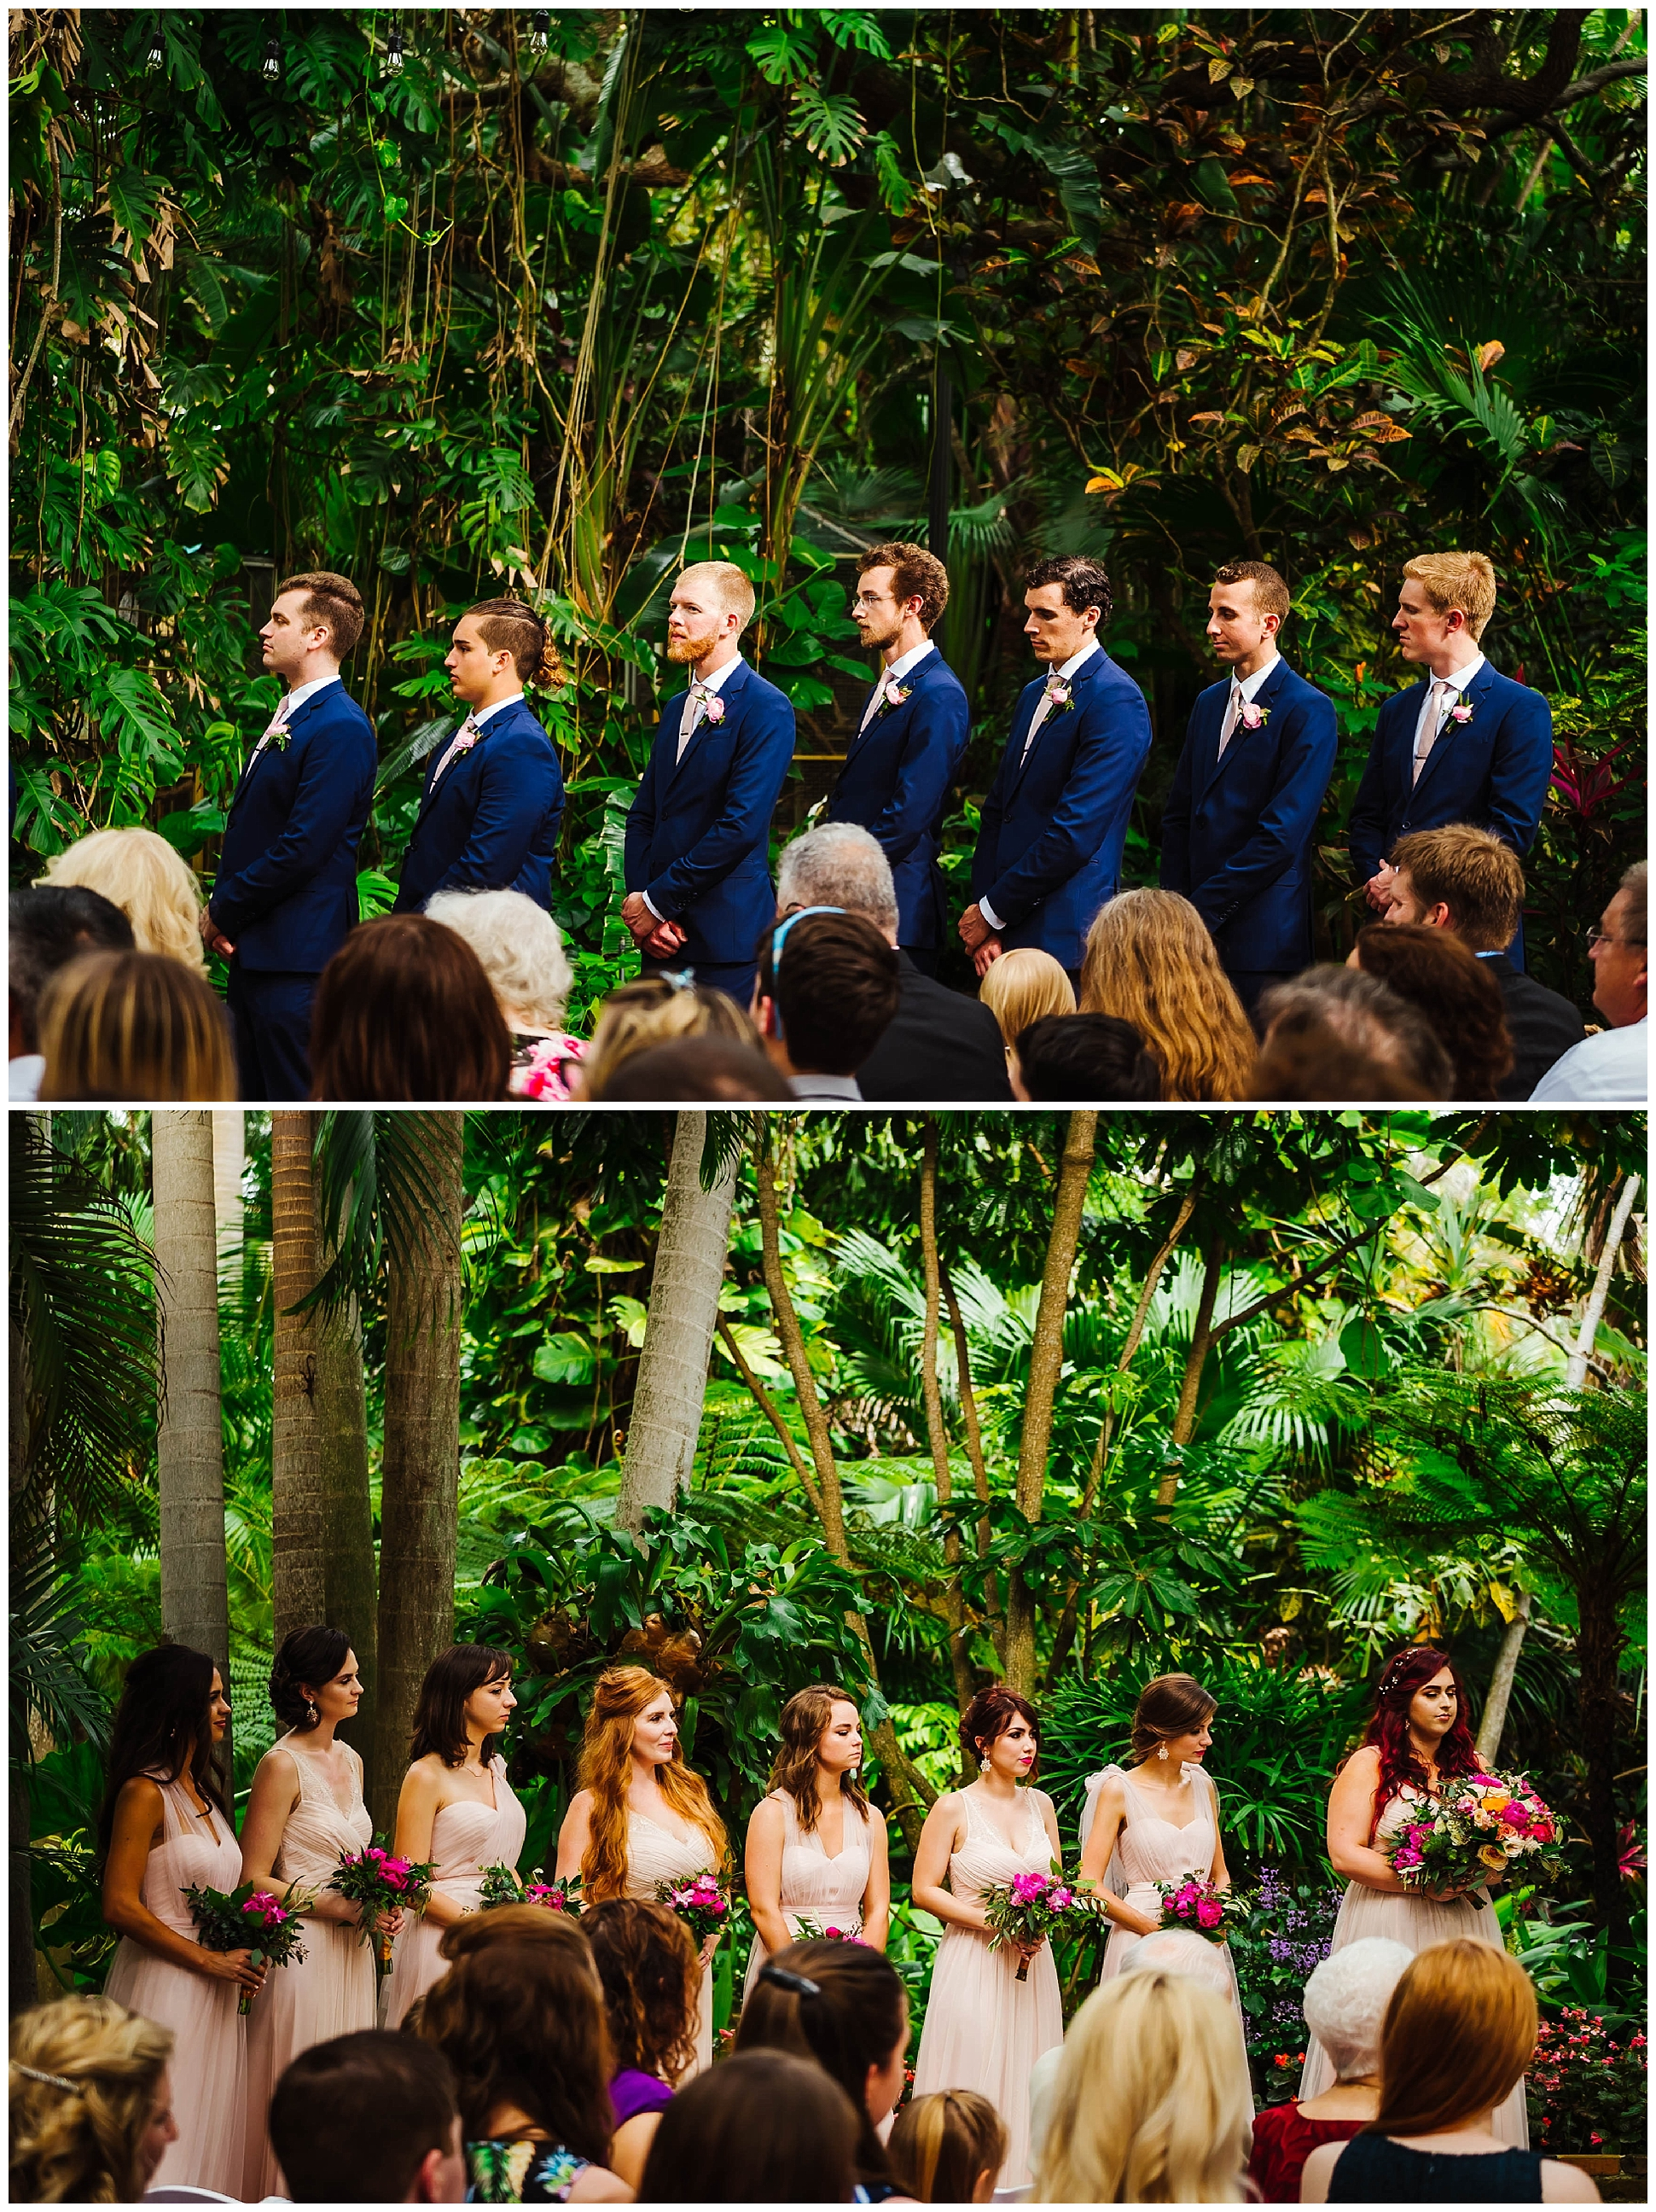 st-pete-wedding-photographer-sunken-gardens-crystal-ballroom-princess-dancer_0153.jpg